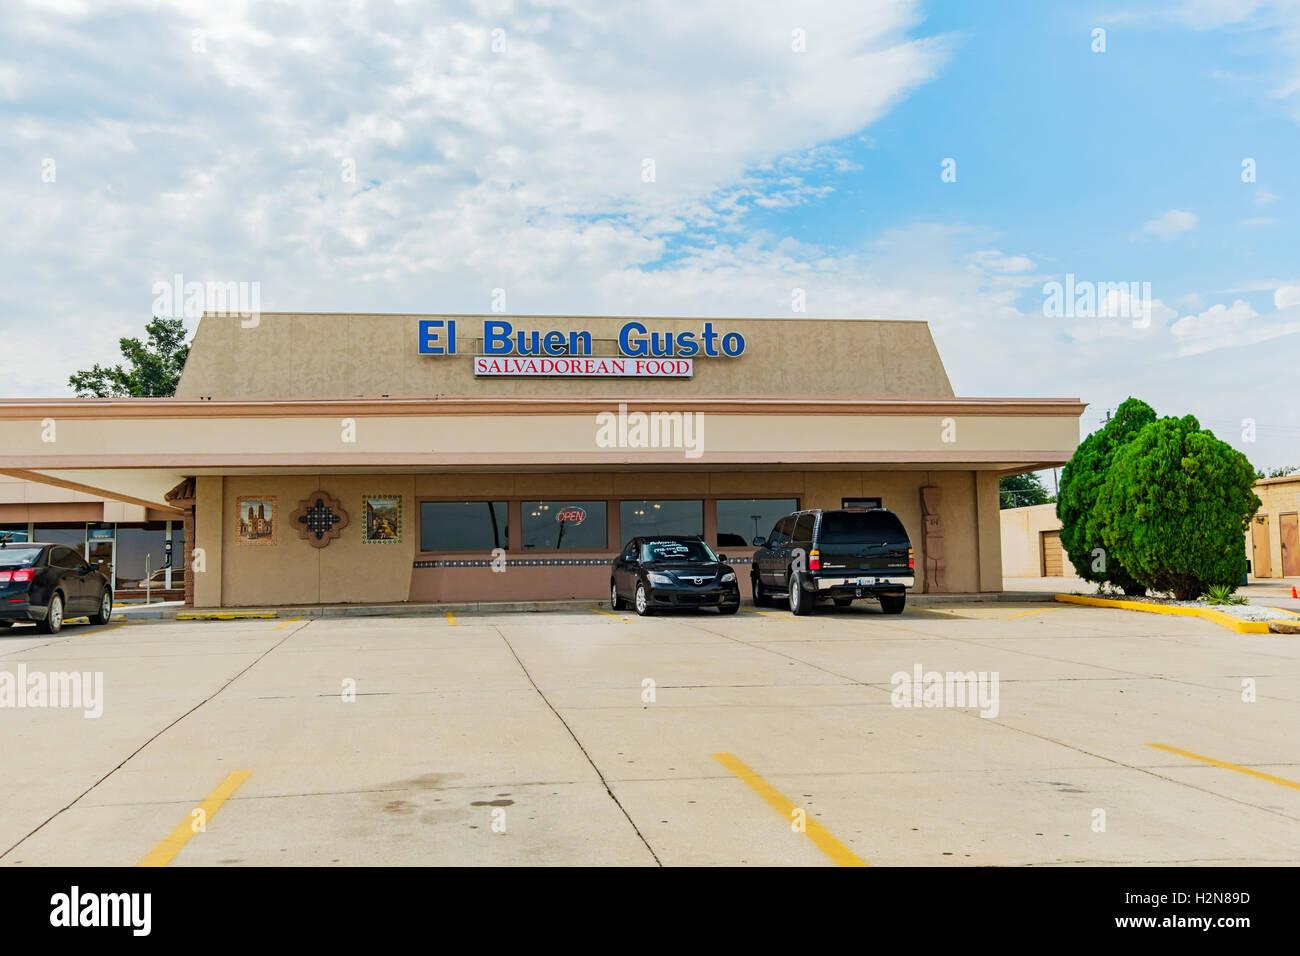 The exterior of El Buen Gusto Salvadorean restaurant 2116 SW 74th, Oklahoma City, Oklahoma, USA. - Stock Image